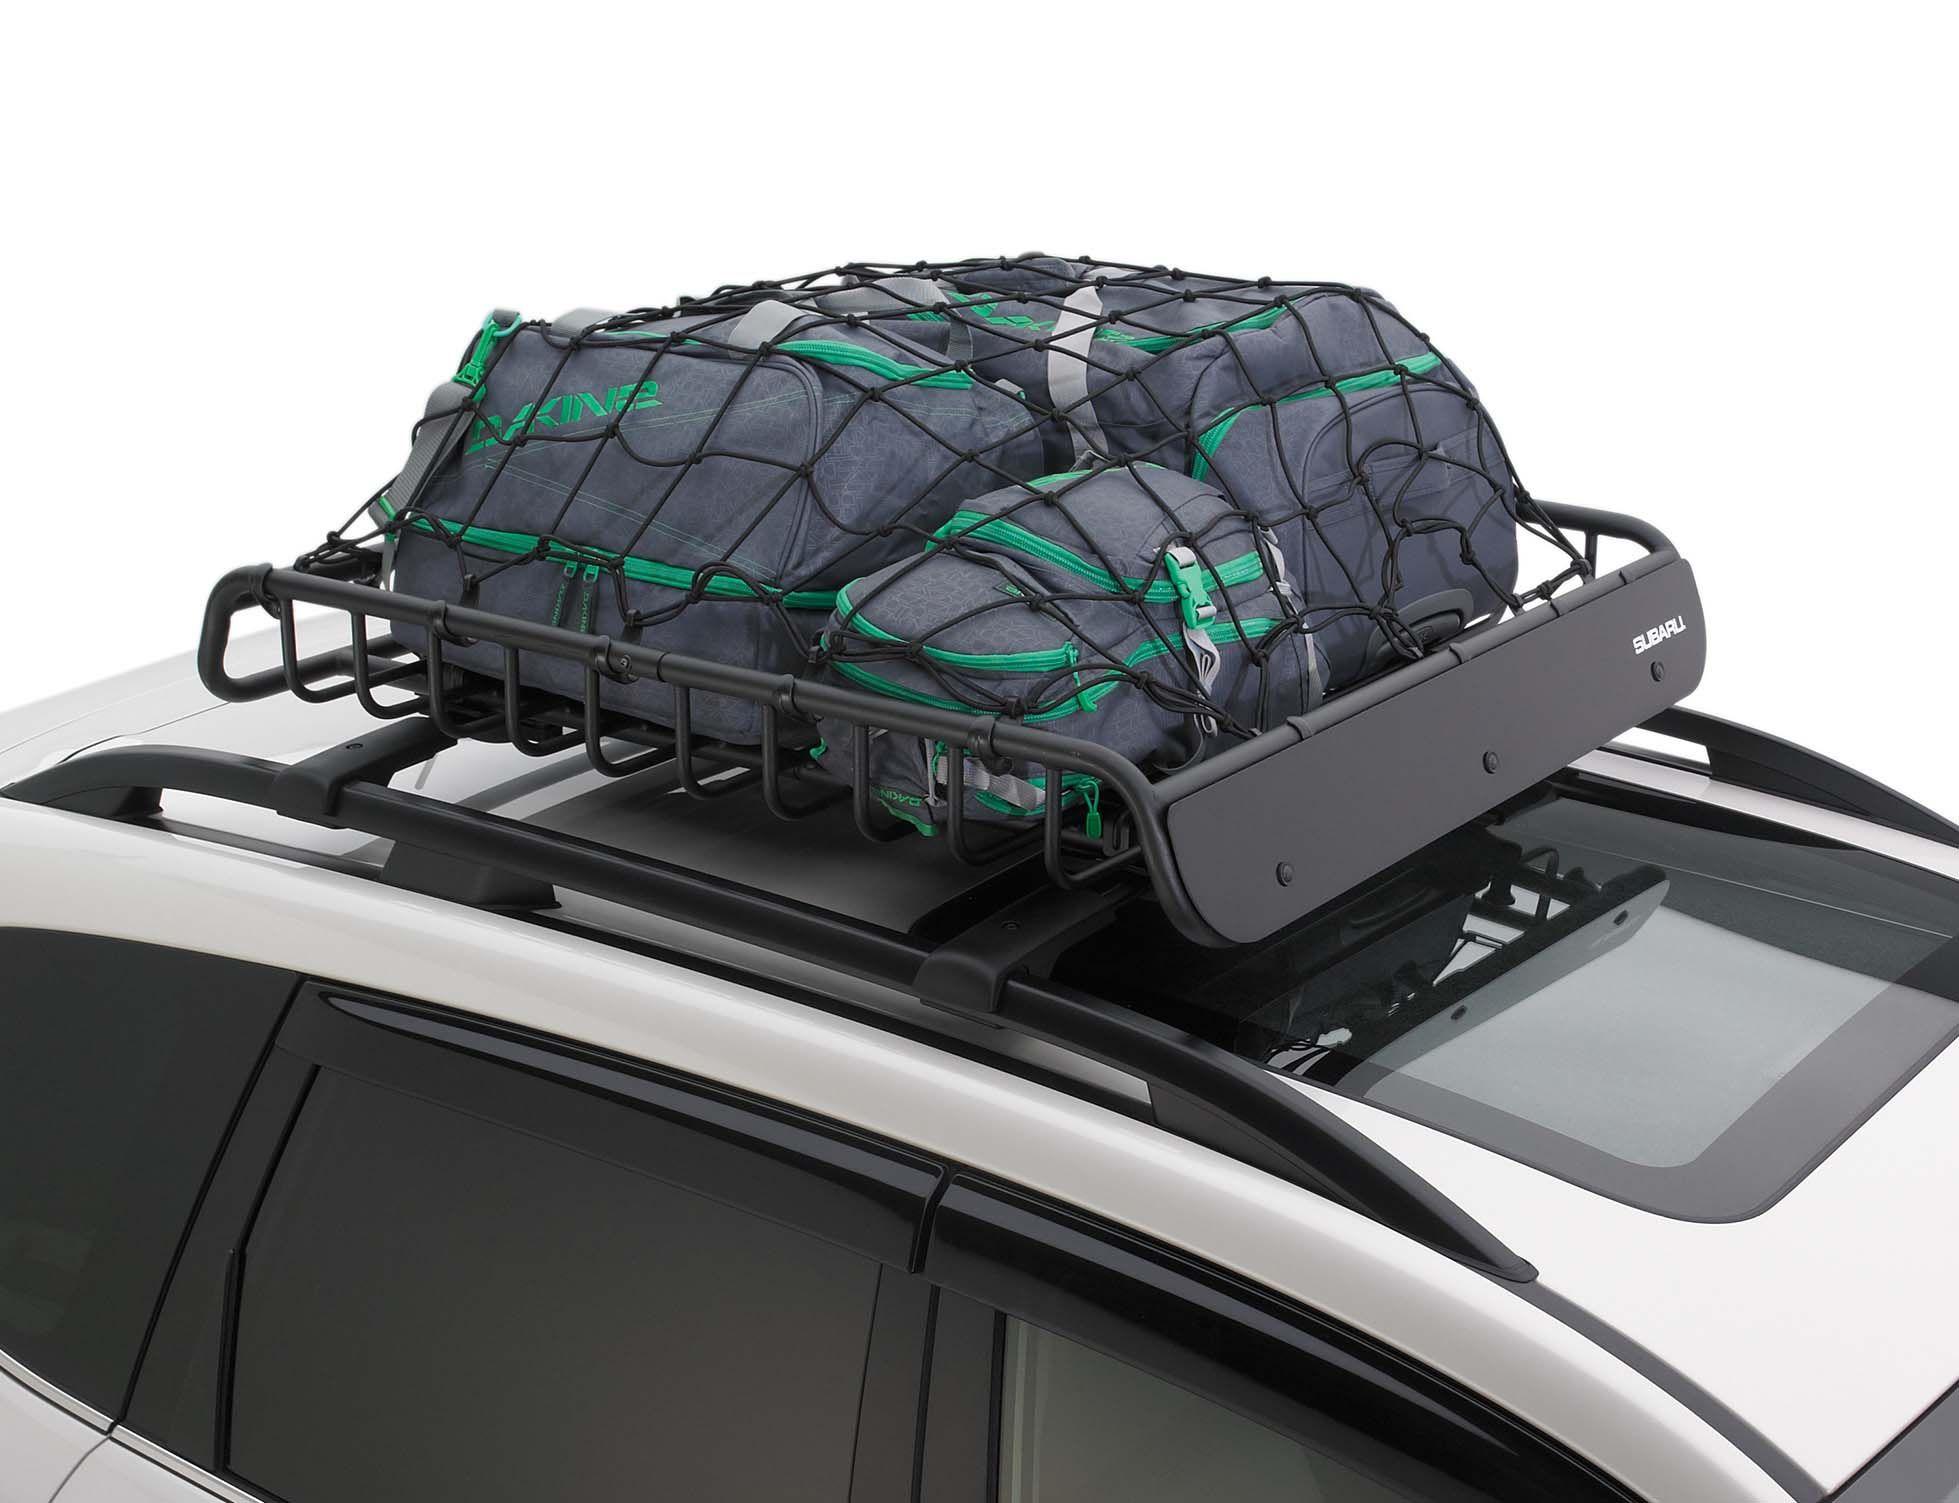 2015 Subaru Xv Crosstrek E361ssa200 Heavy Duty Roof